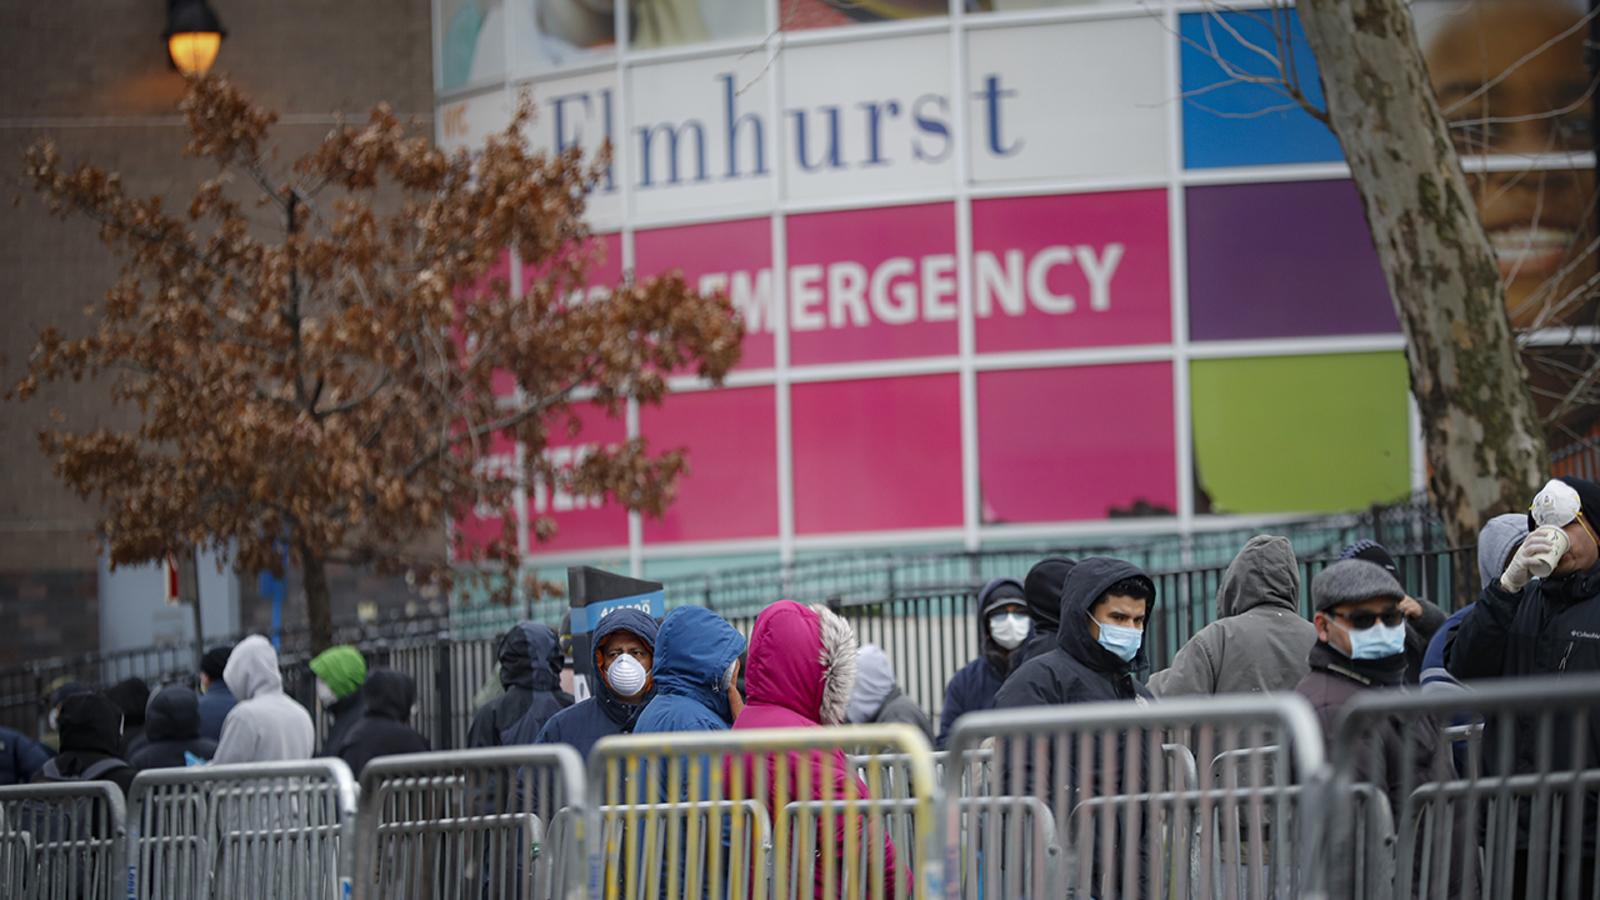 13 coronavirus patients die at same New York City hospital in 24 hours